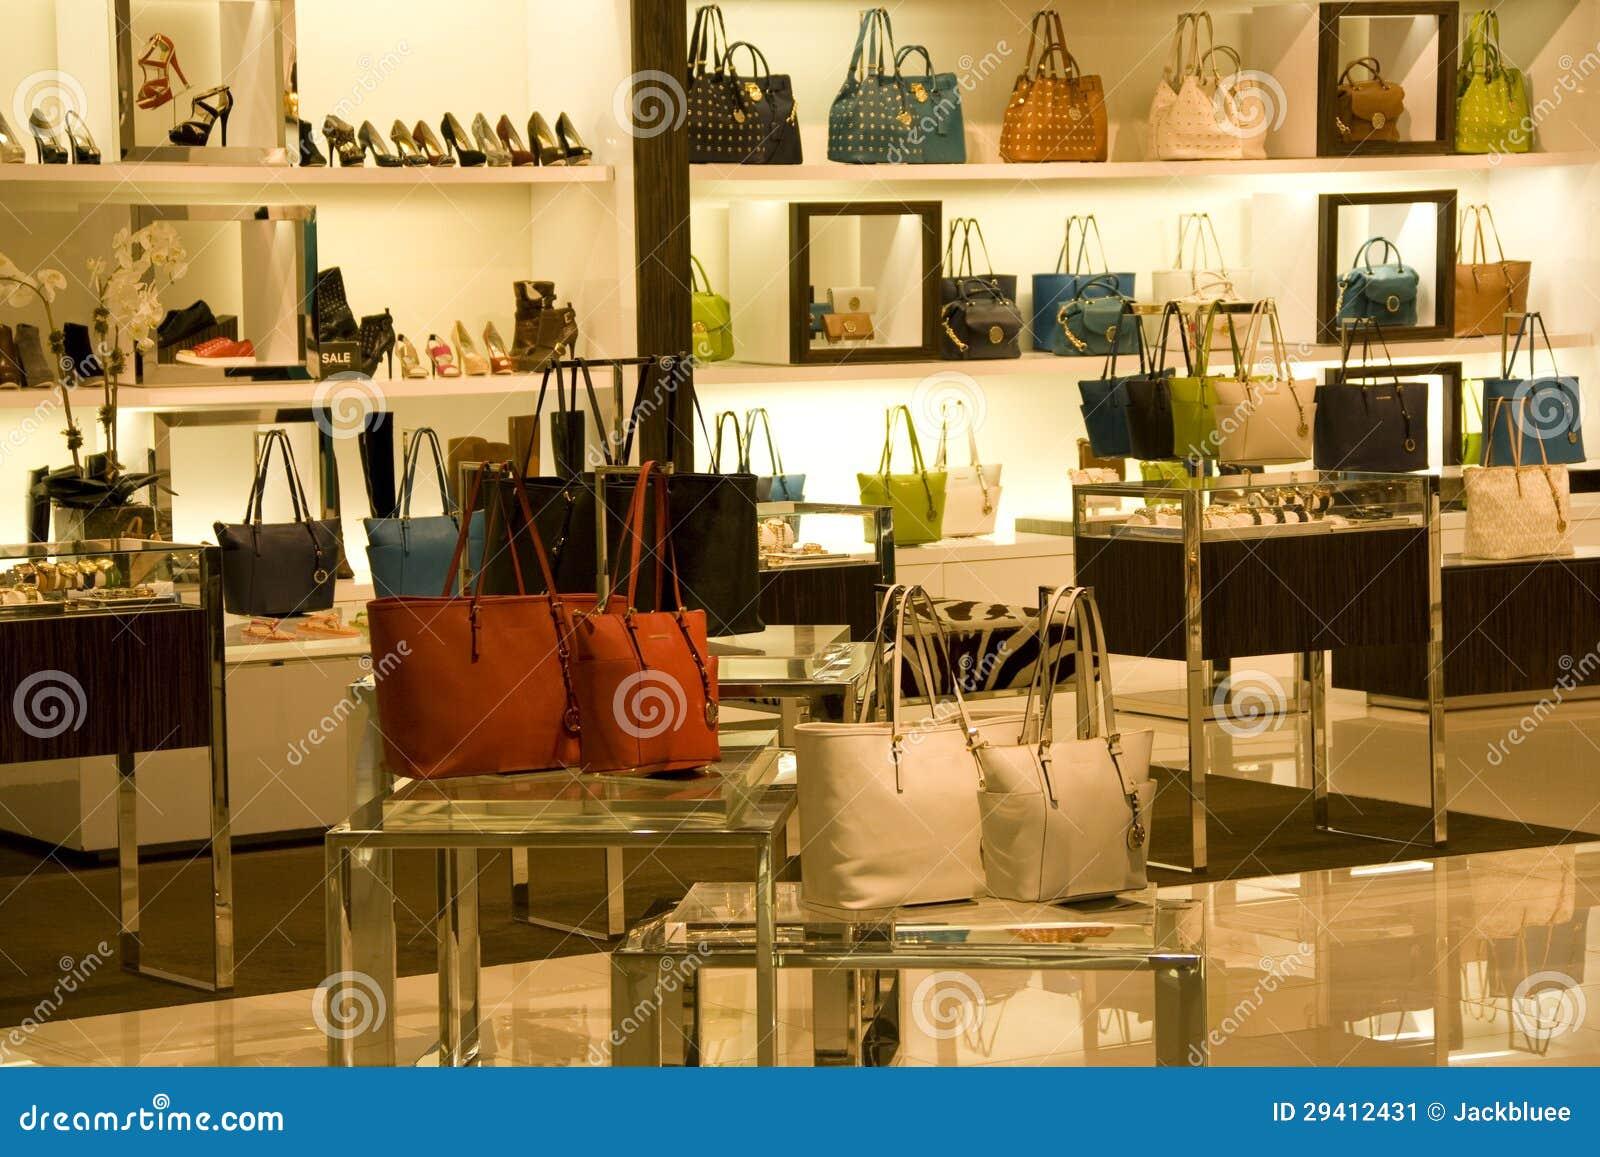 magasin de chaussures de sac main et image stock image 29412431. Black Bedroom Furniture Sets. Home Design Ideas